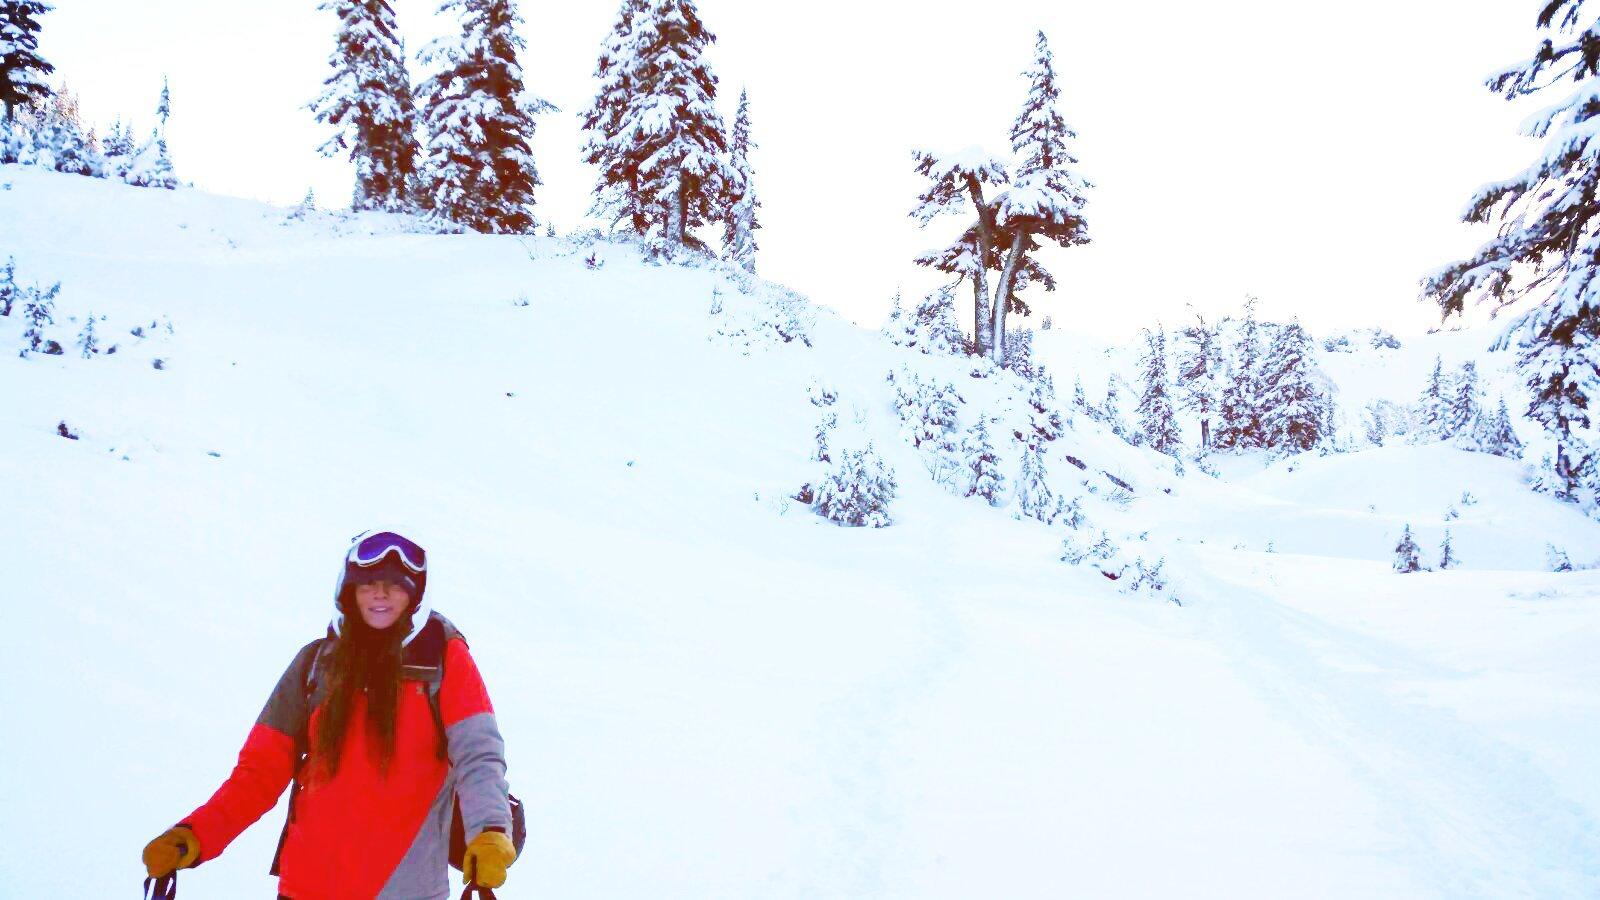 November 2014 at Mt Baker